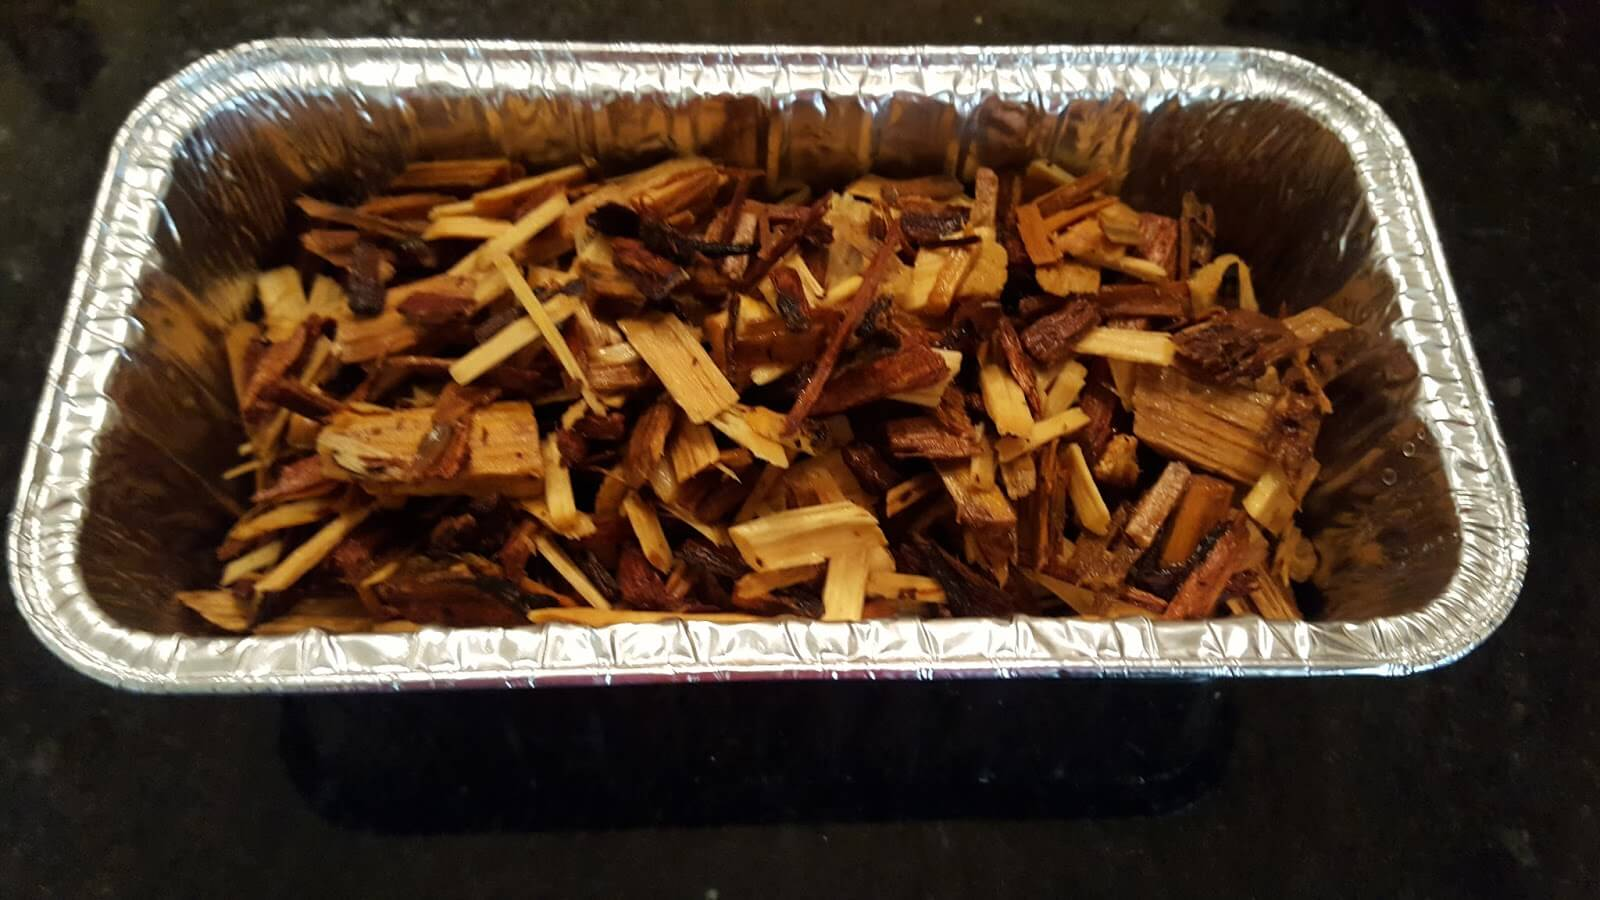 Soak wood chips before smoking chicken